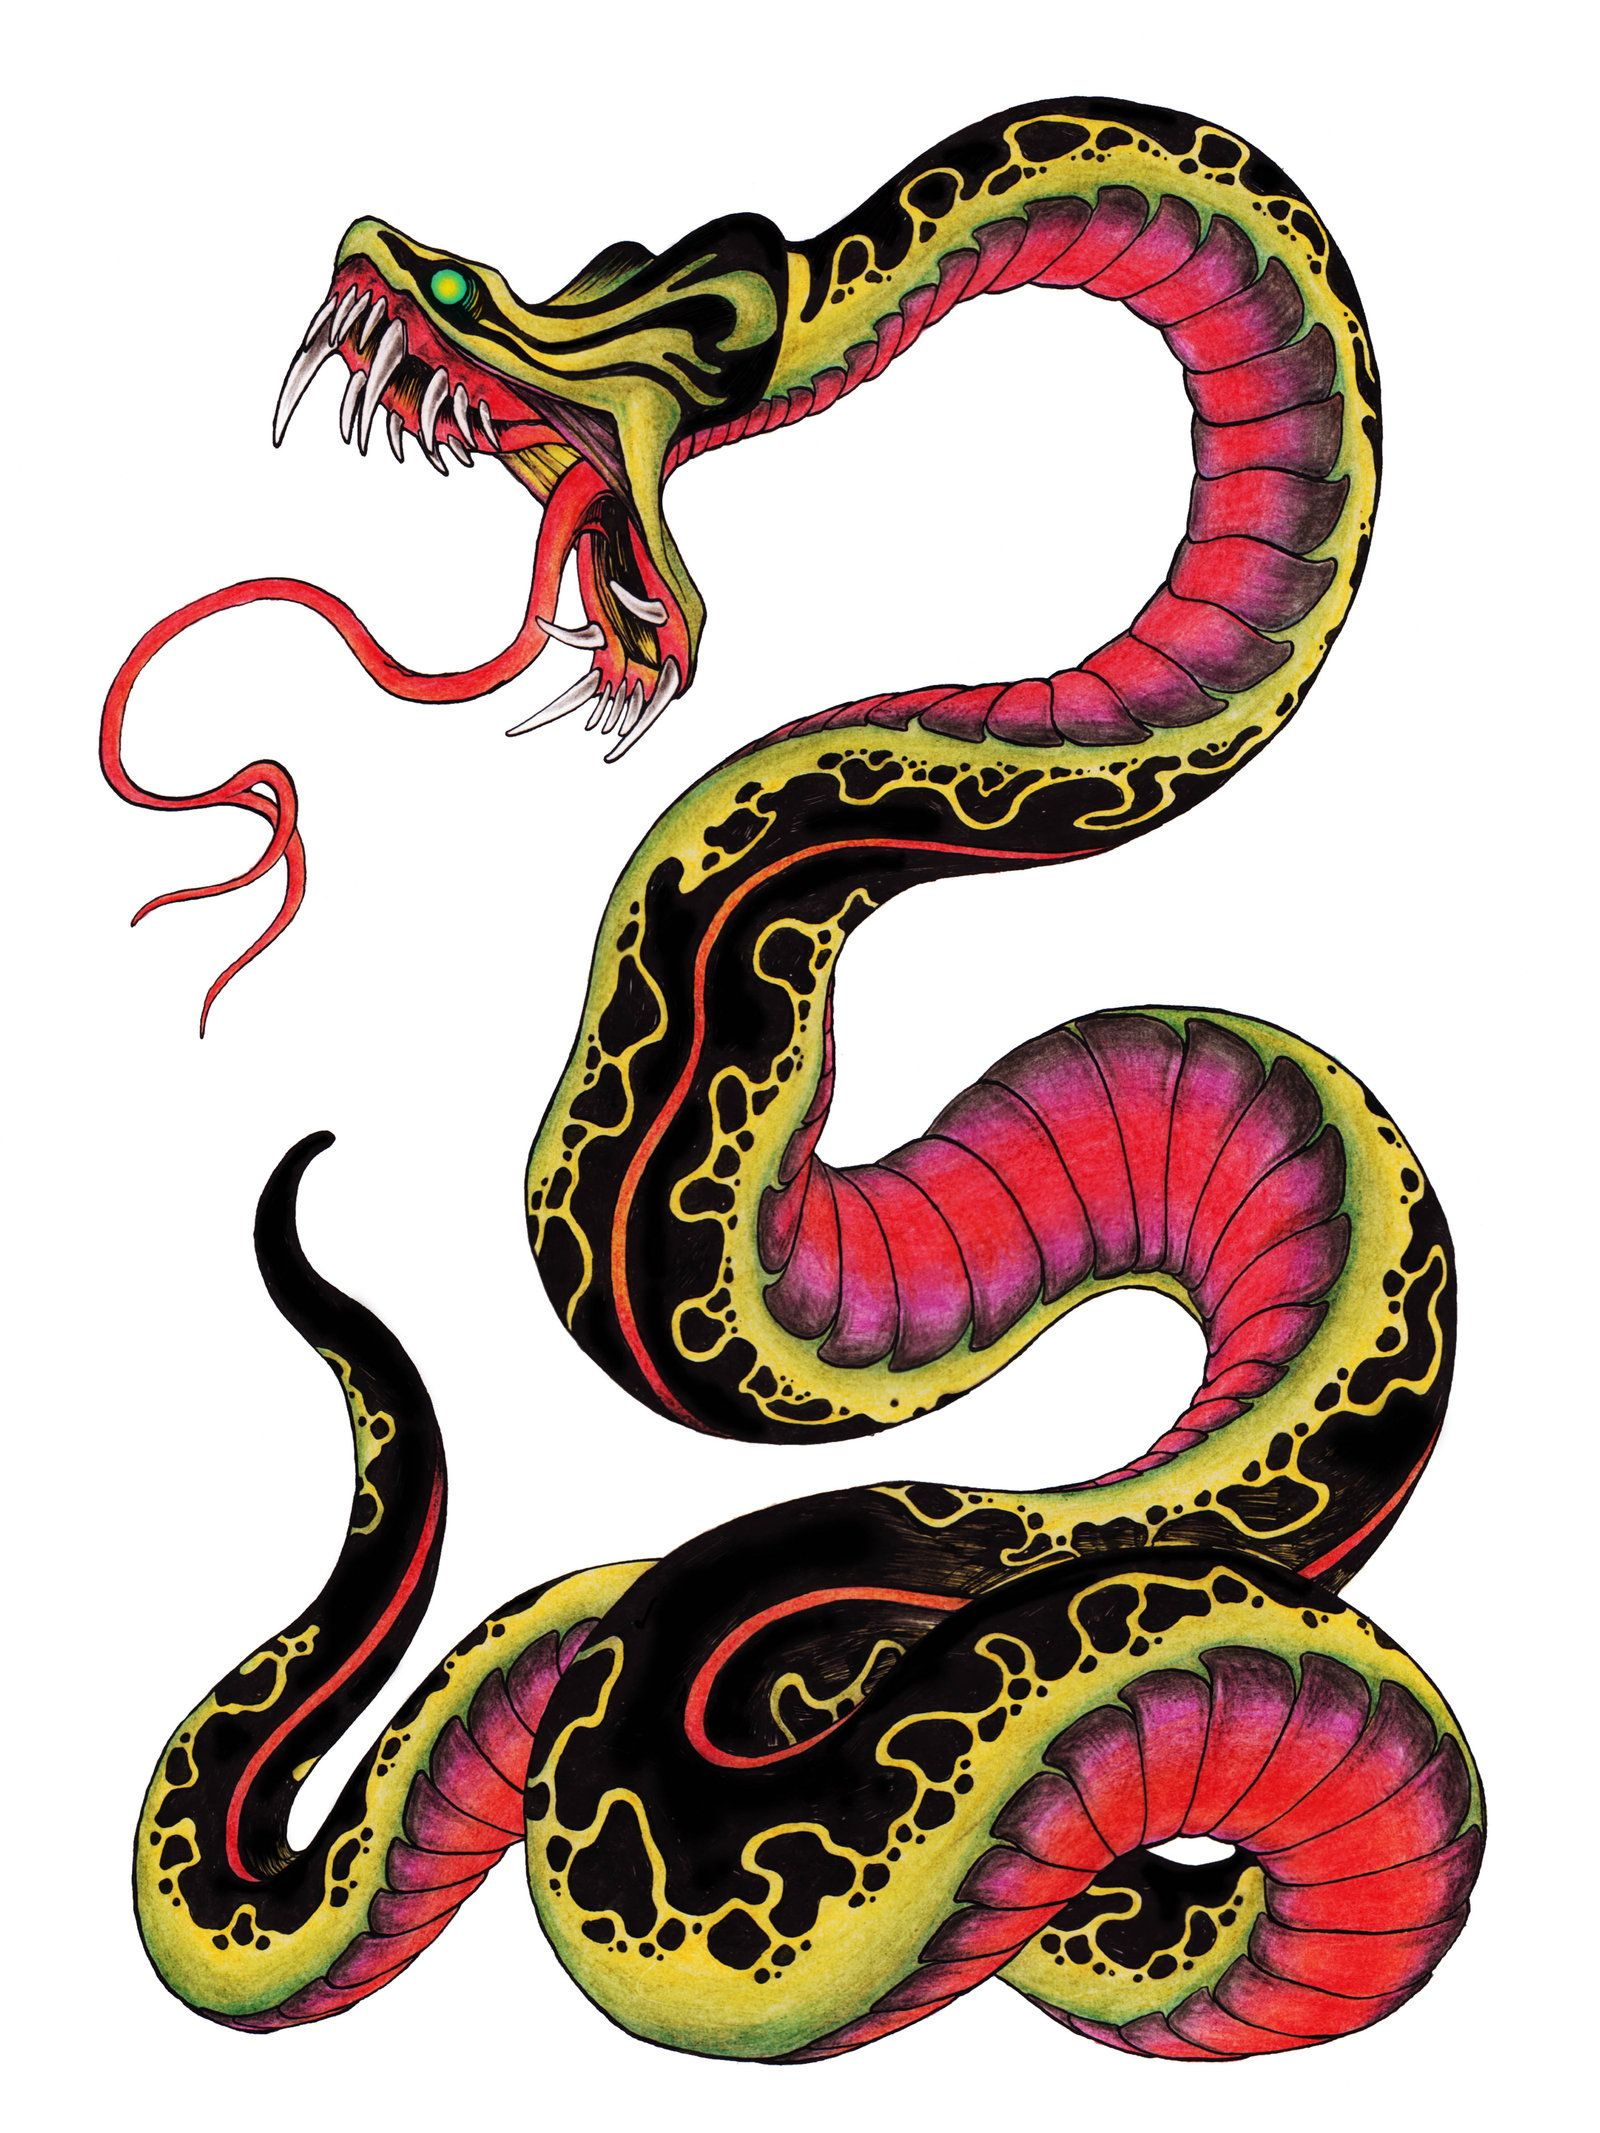 snake tattoo design by on deviantart too many tatts pinterest. Black Bedroom Furniture Sets. Home Design Ideas